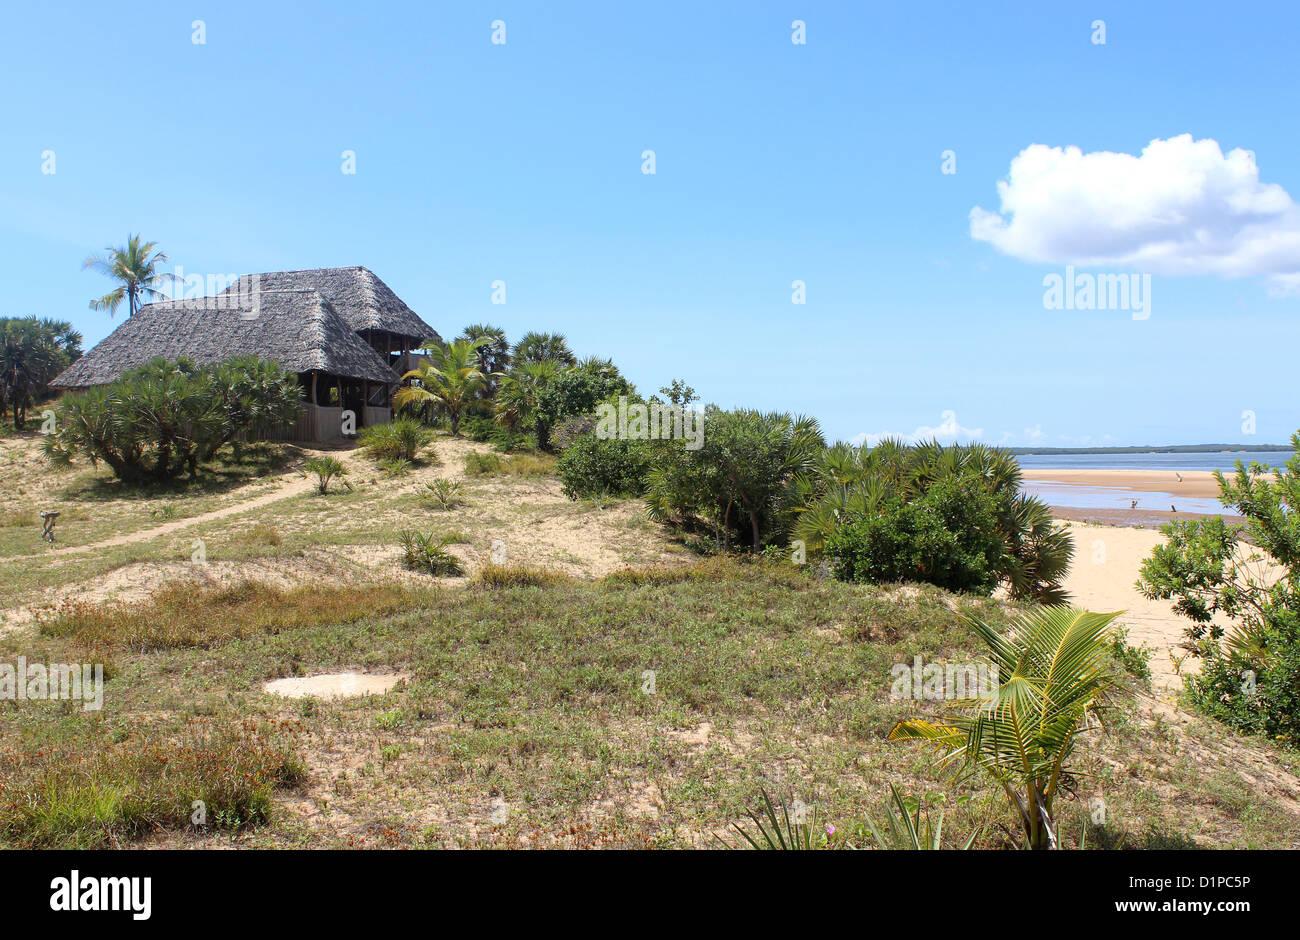 Kipungani Explorer palm beach resort, banda de paja Guest accommodation, Isla de Lamu, Kenya, Africa Oriental Imagen De Stock